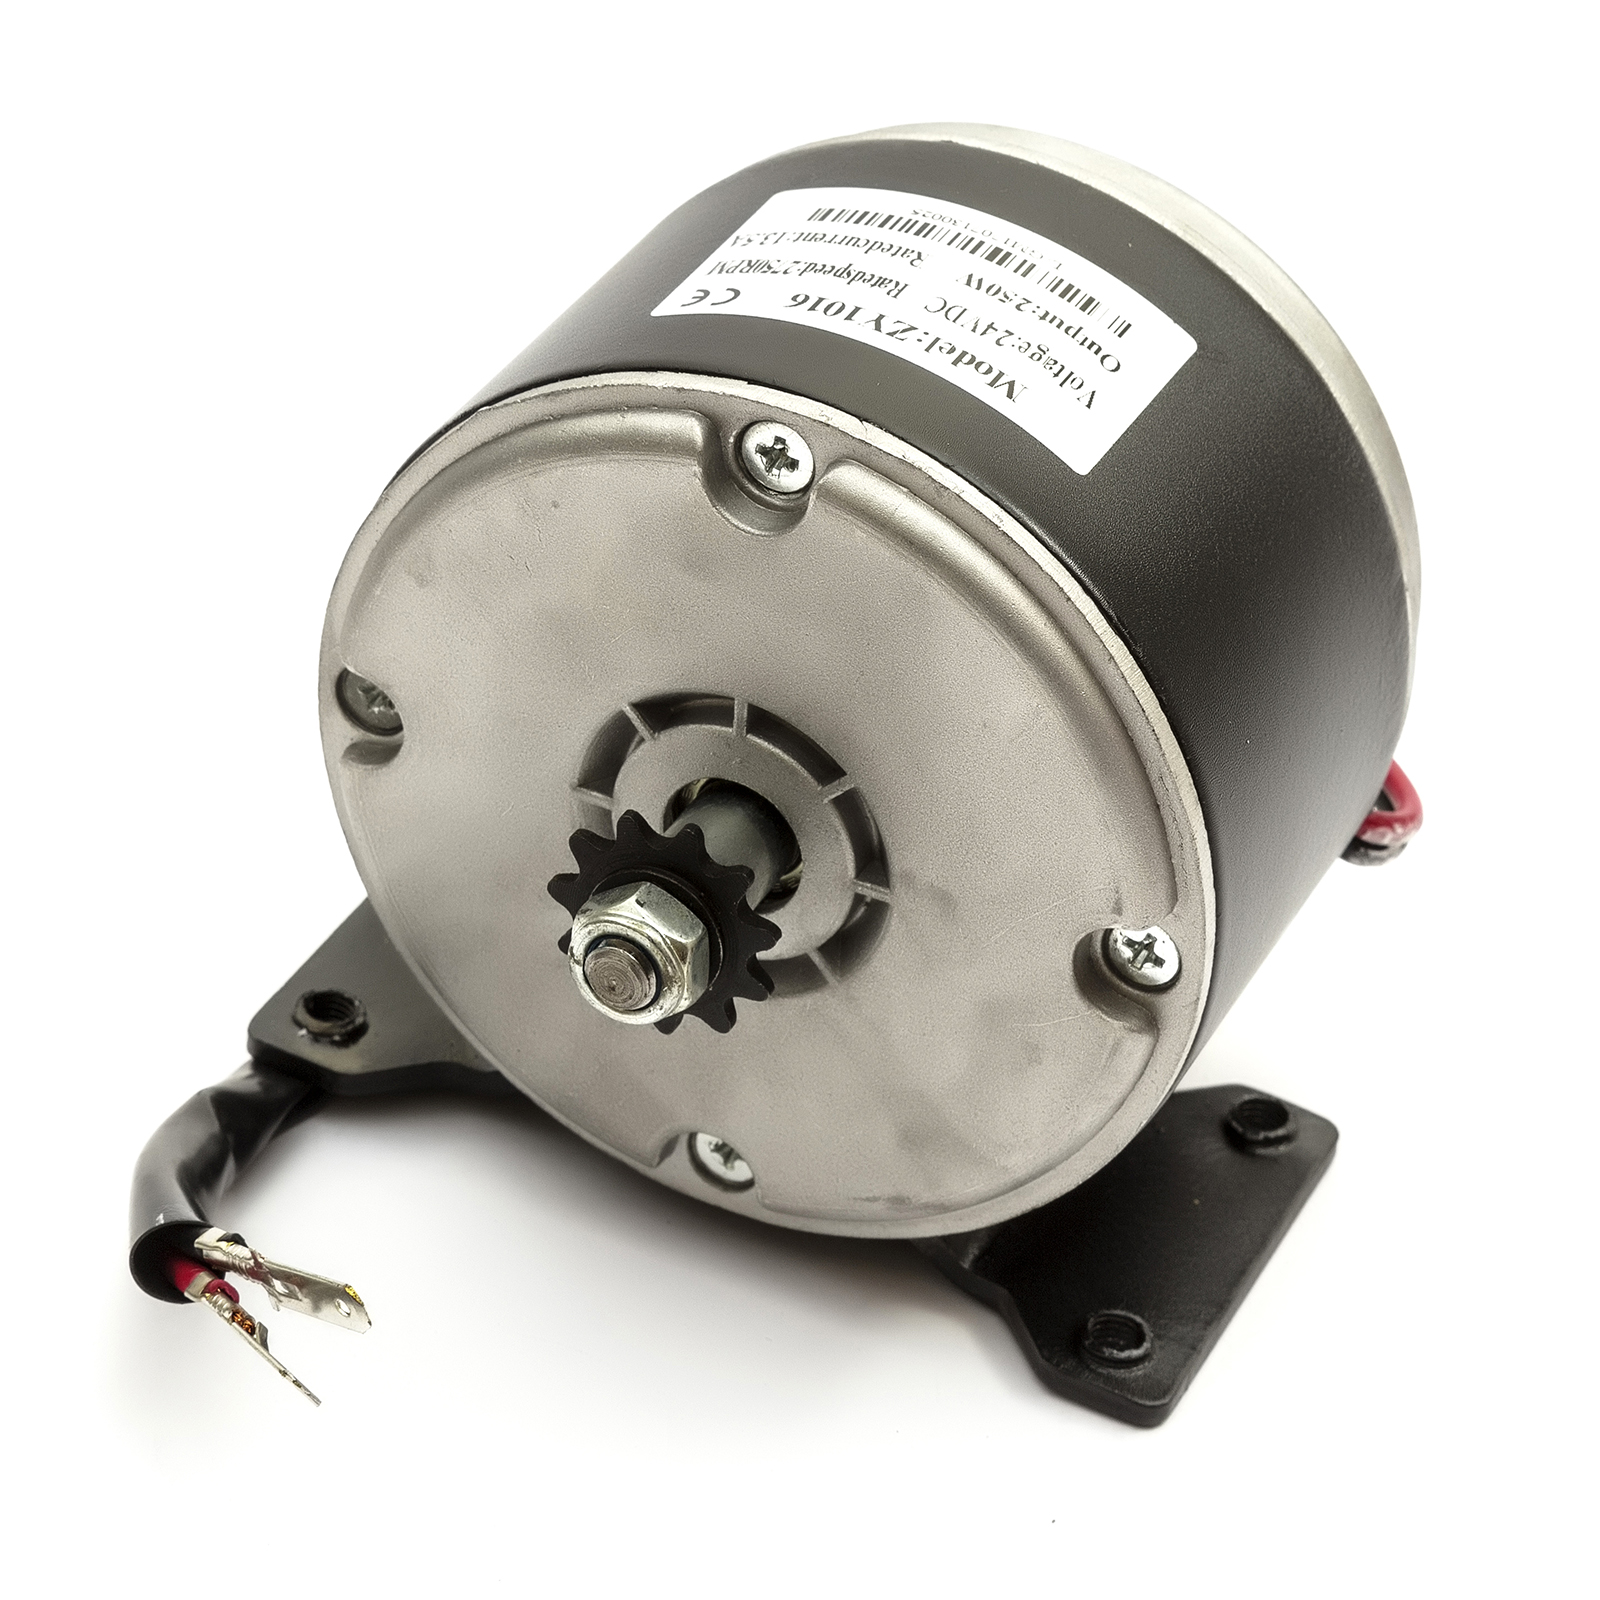 Electric Scooter Motor 24 Volt 250 Watt 11T 6mm Chain Sprocket 24v 250w ZY1016